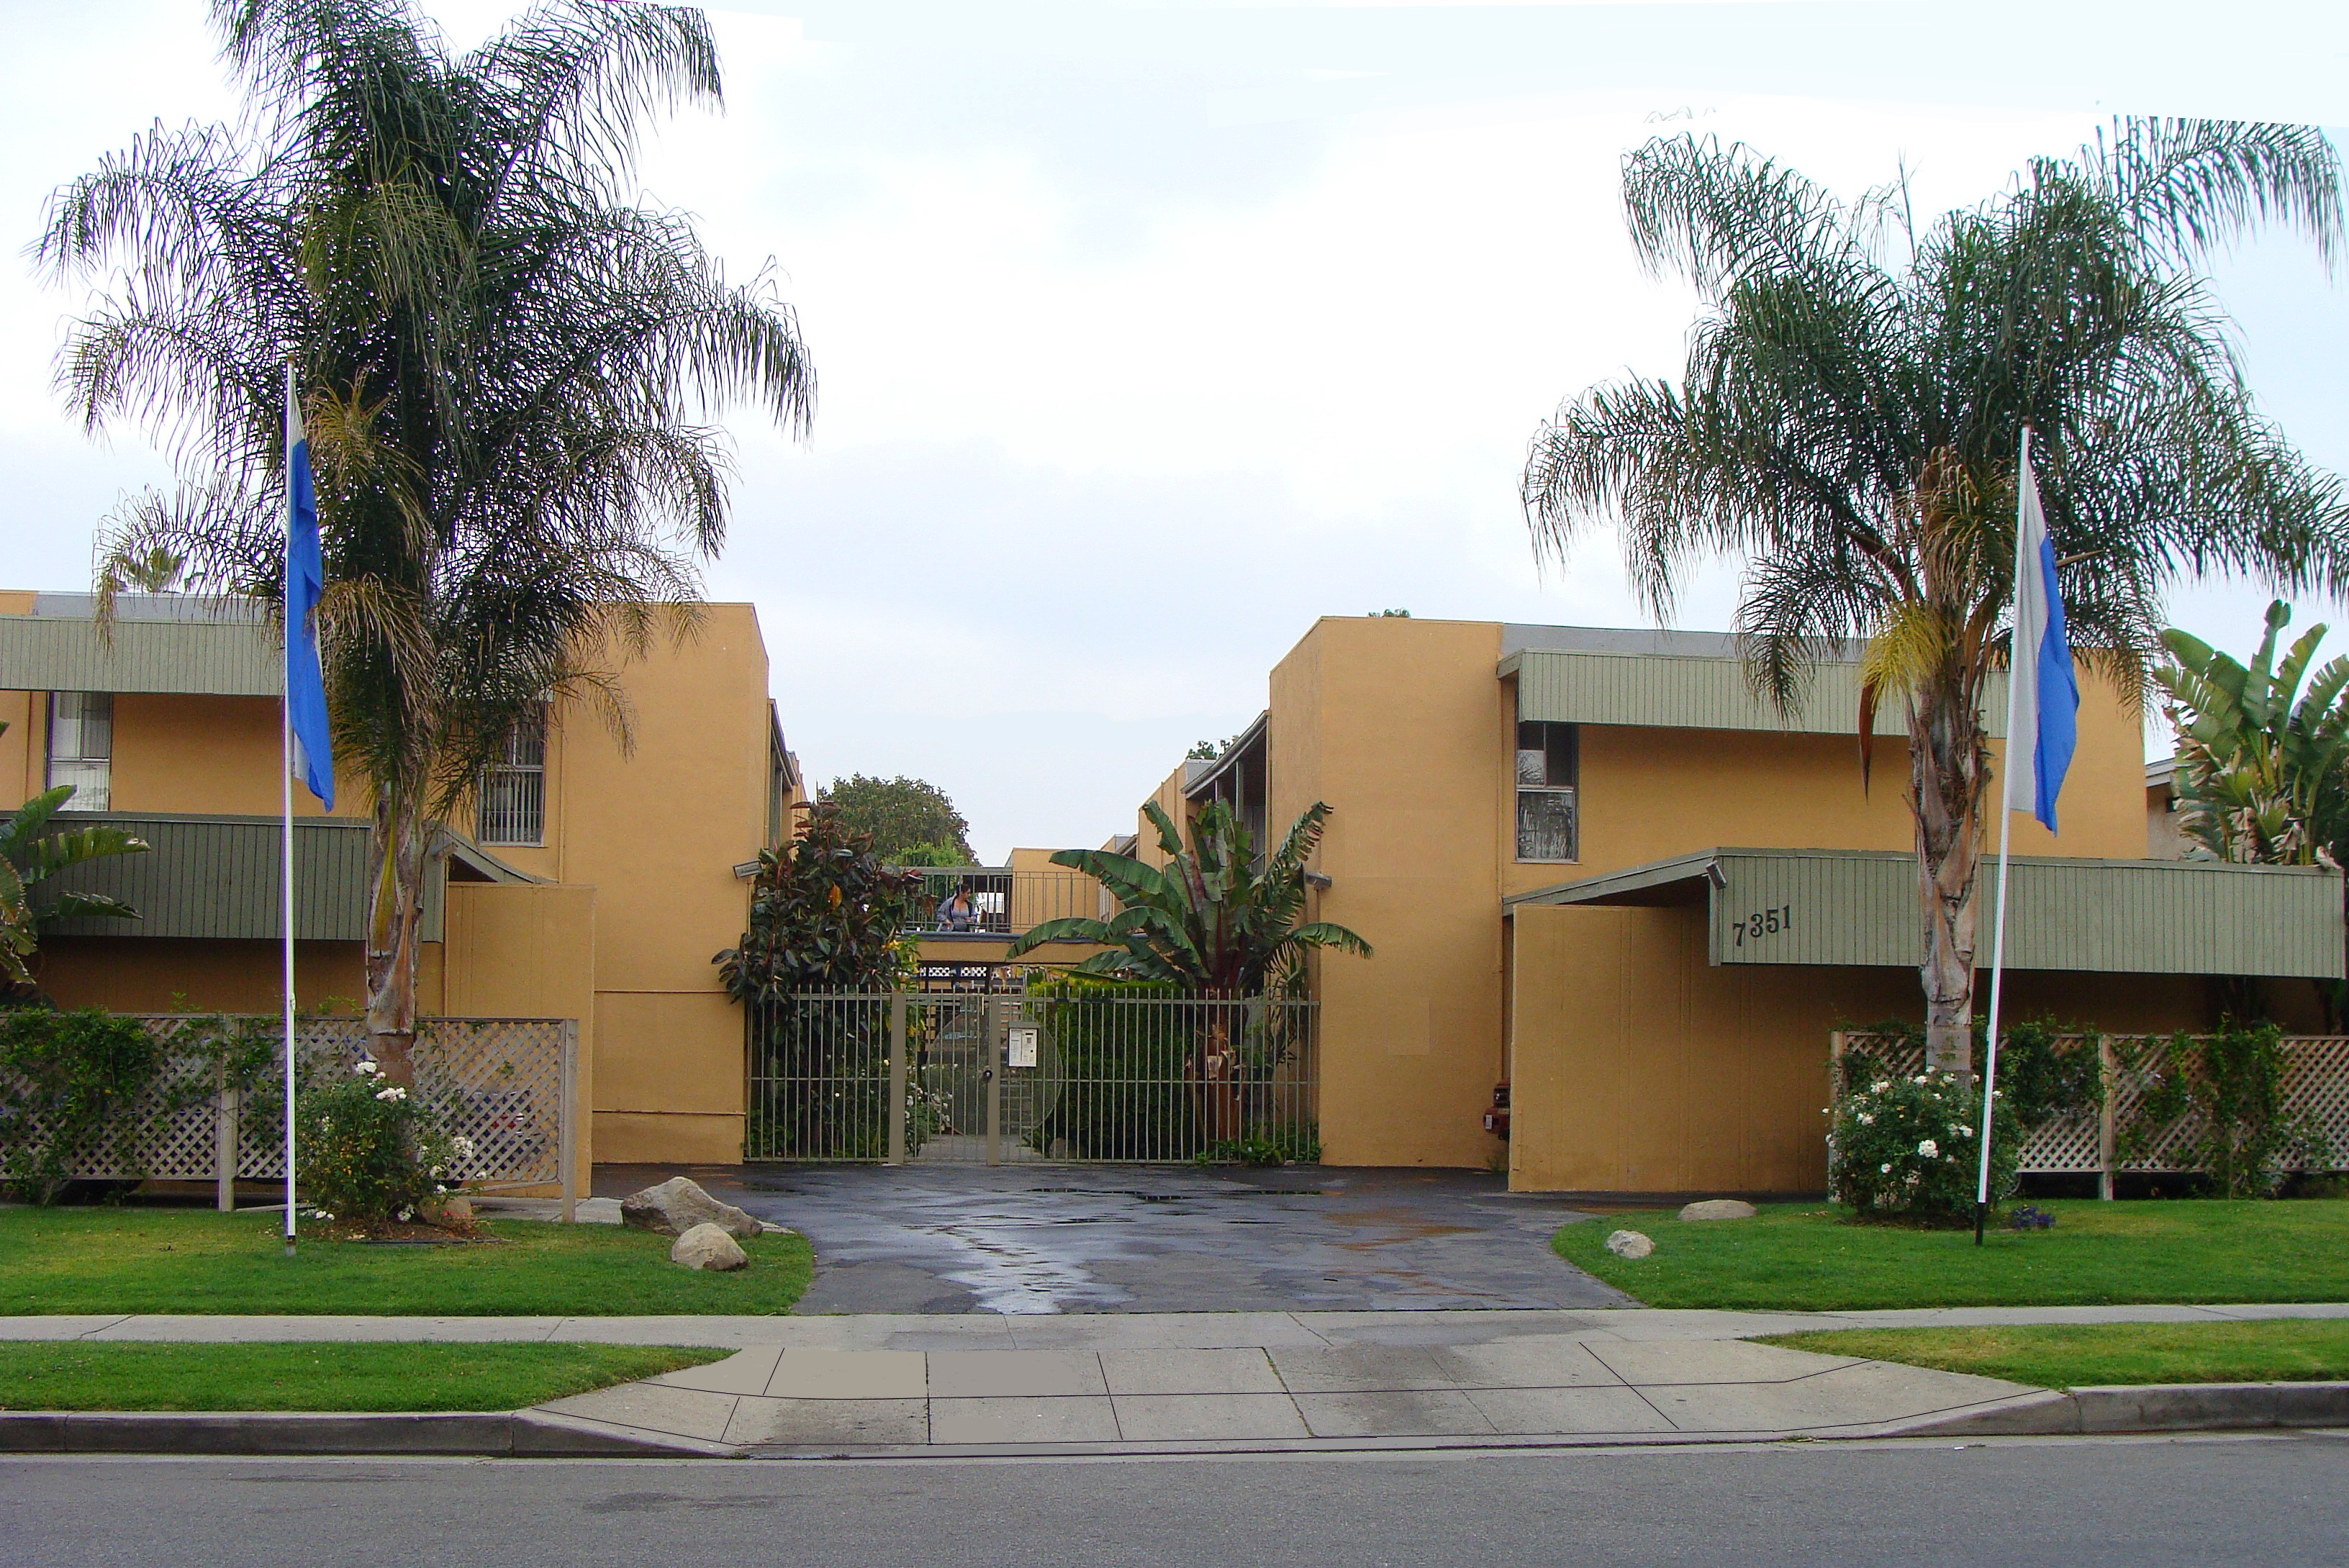 7351 Variel Ave., Canoga Park, CA 91303